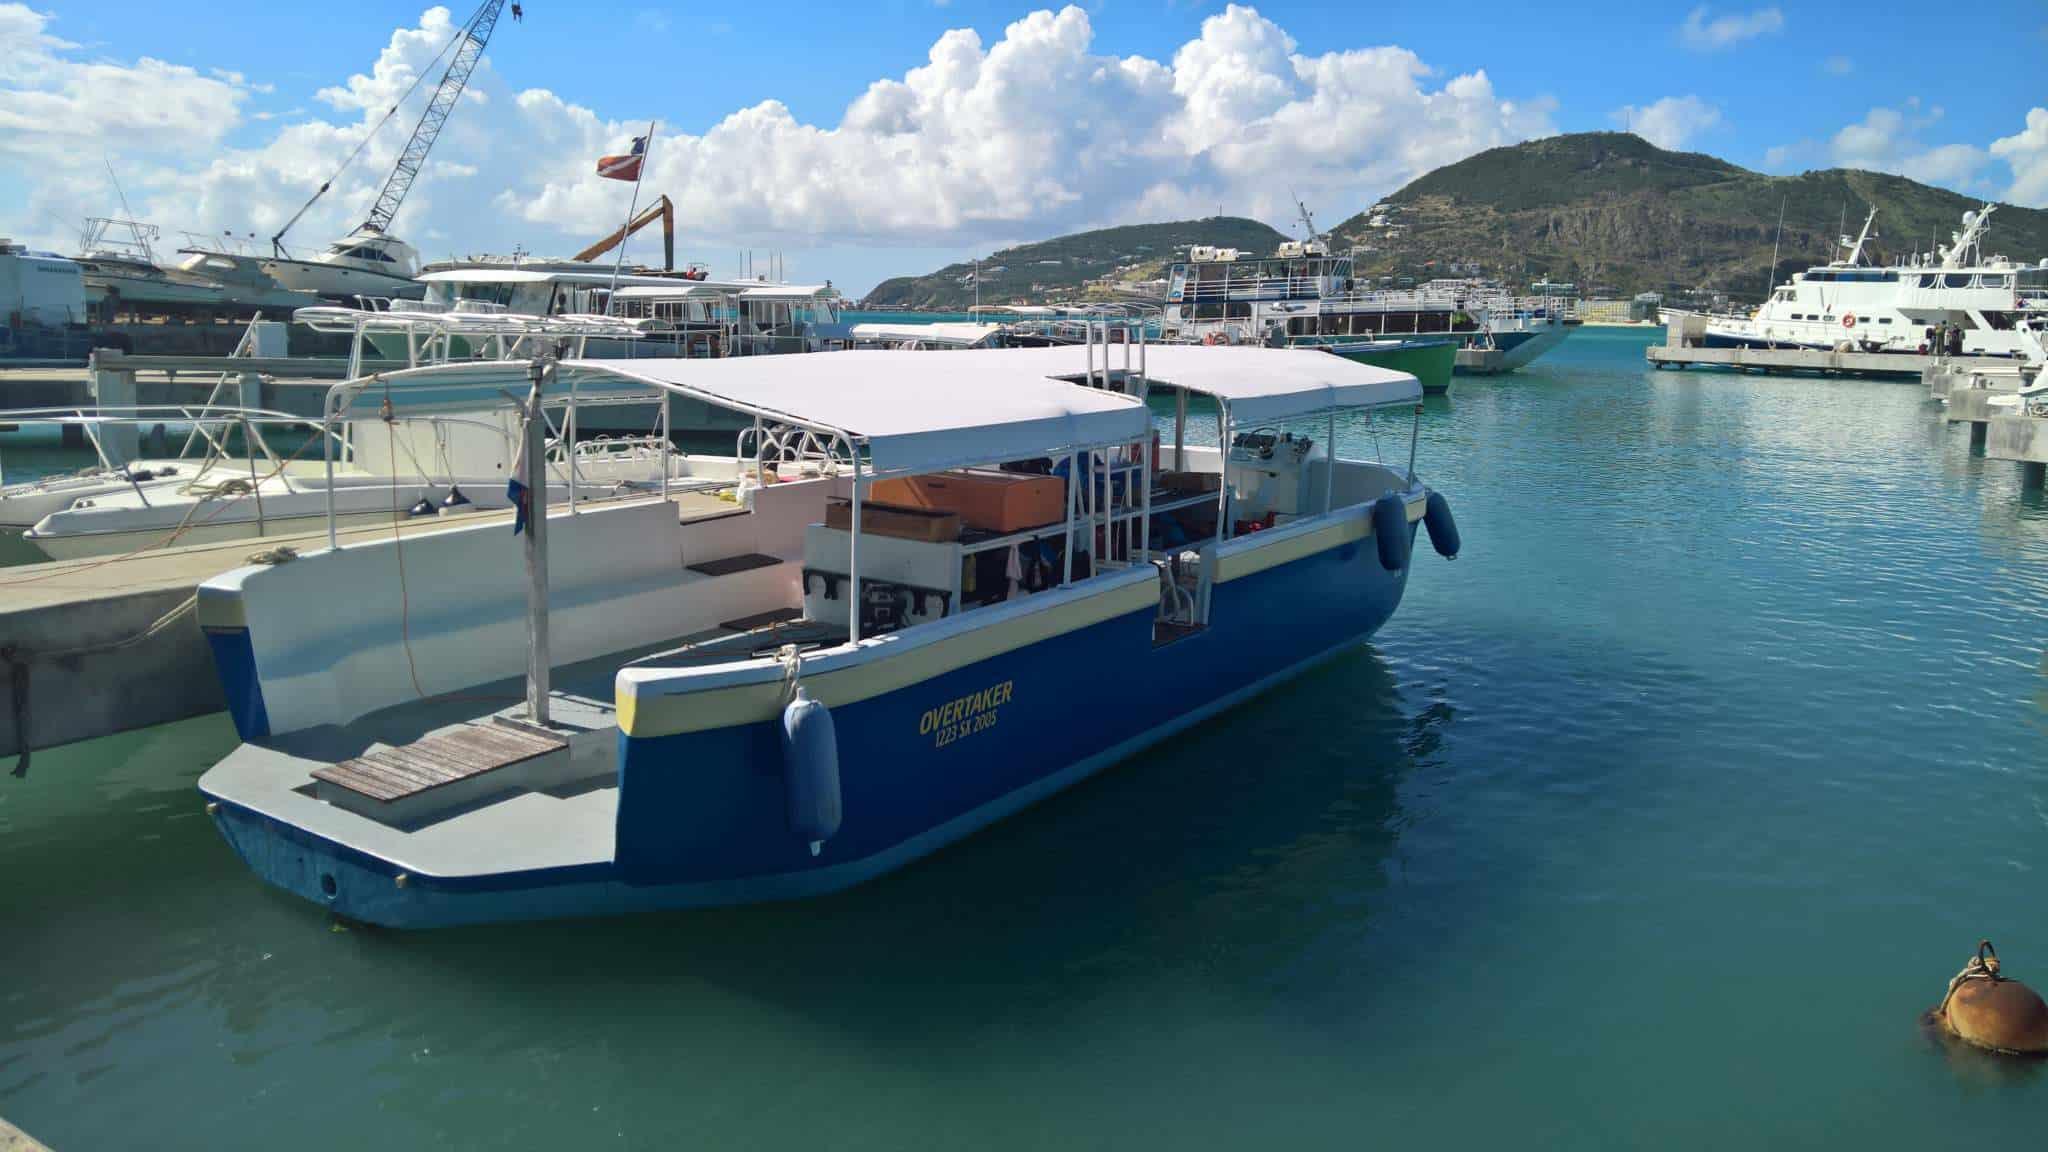 Our adorable boat; The Overtaker, SNUBA SXM, Sint Maarten